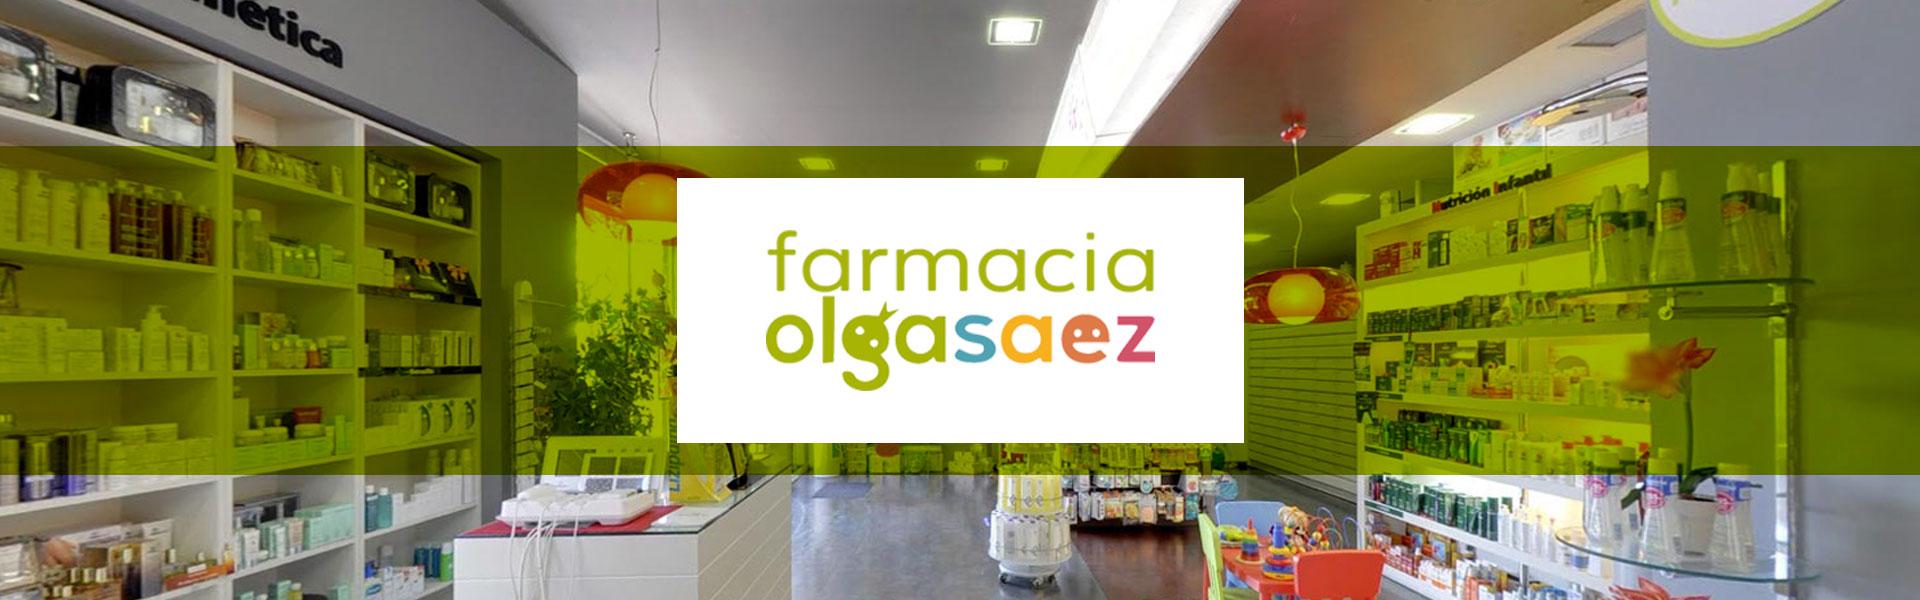 Farmacia Olga Sáez